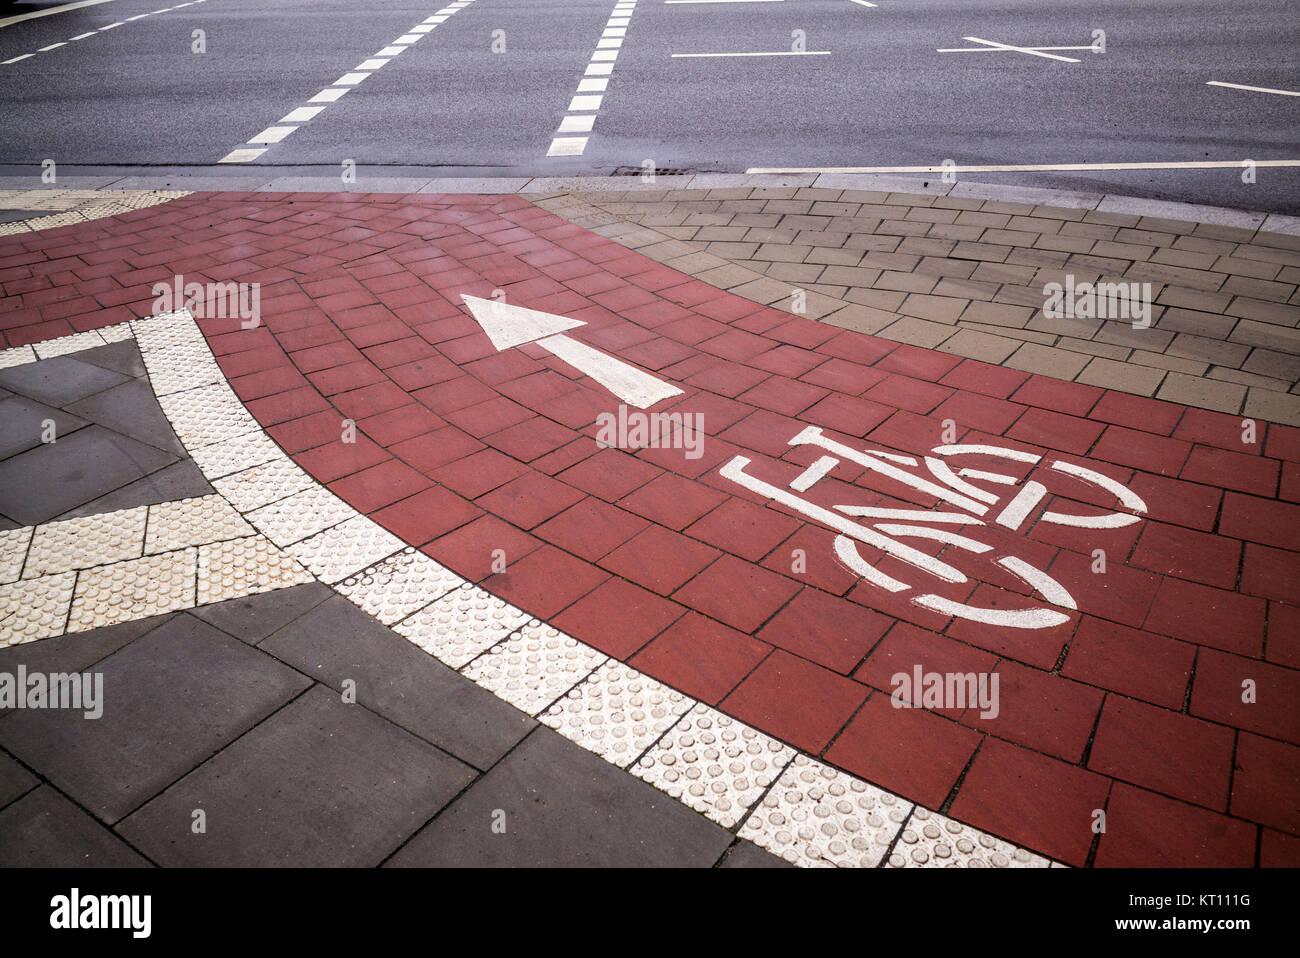 Straßenmarkierung Fahrradweg - Stock Image